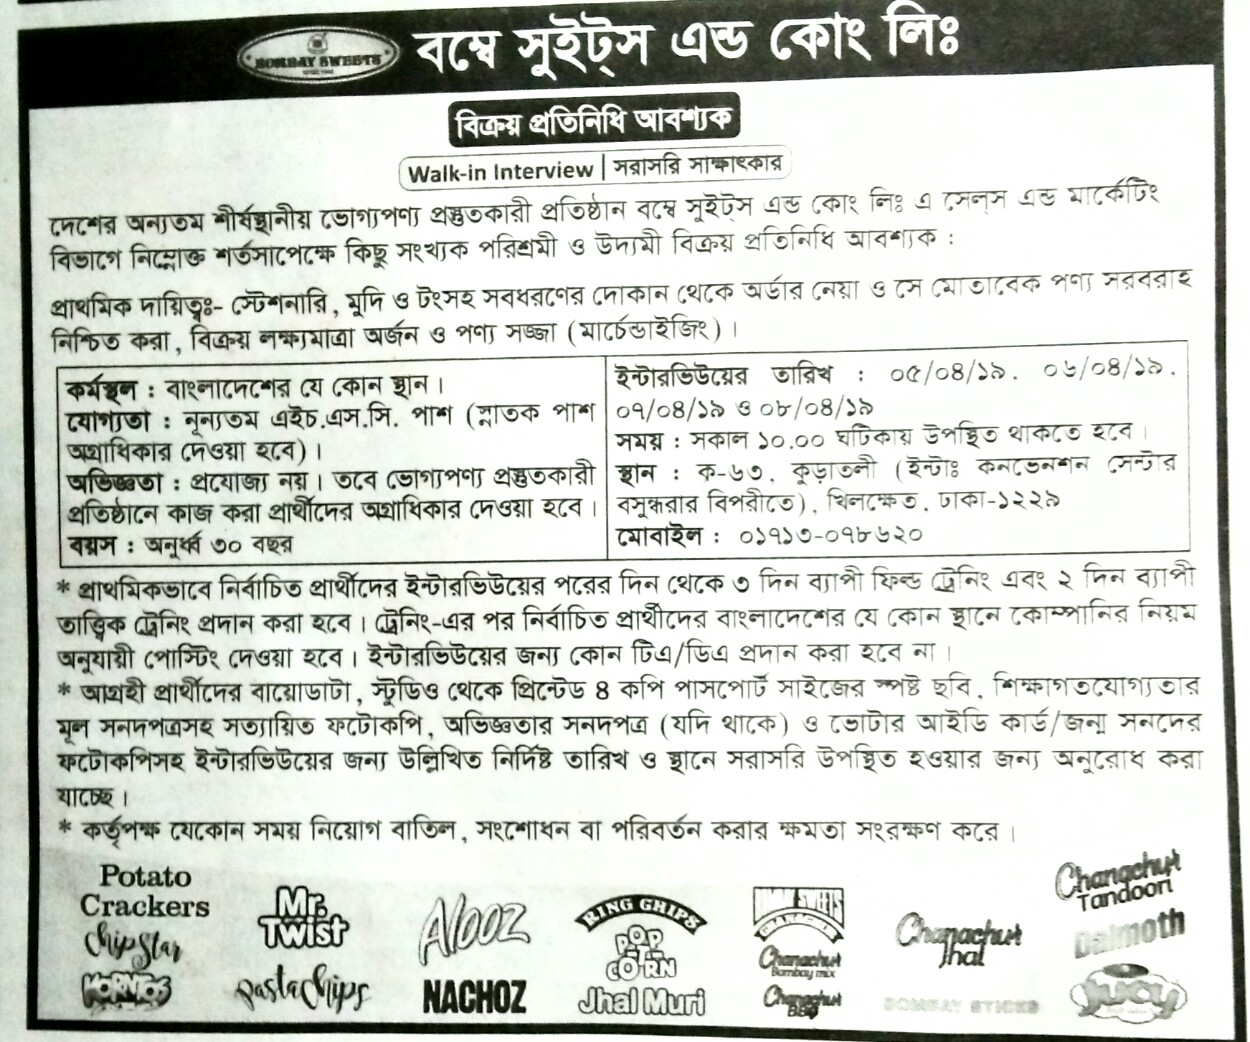 Bombay Sweets and Co. Ltd. Job circular 2019 বম্বে সুইটস এন্ড কোং লিঃ নিয়োগ বিজ্ঞপ্তি ২০১৯